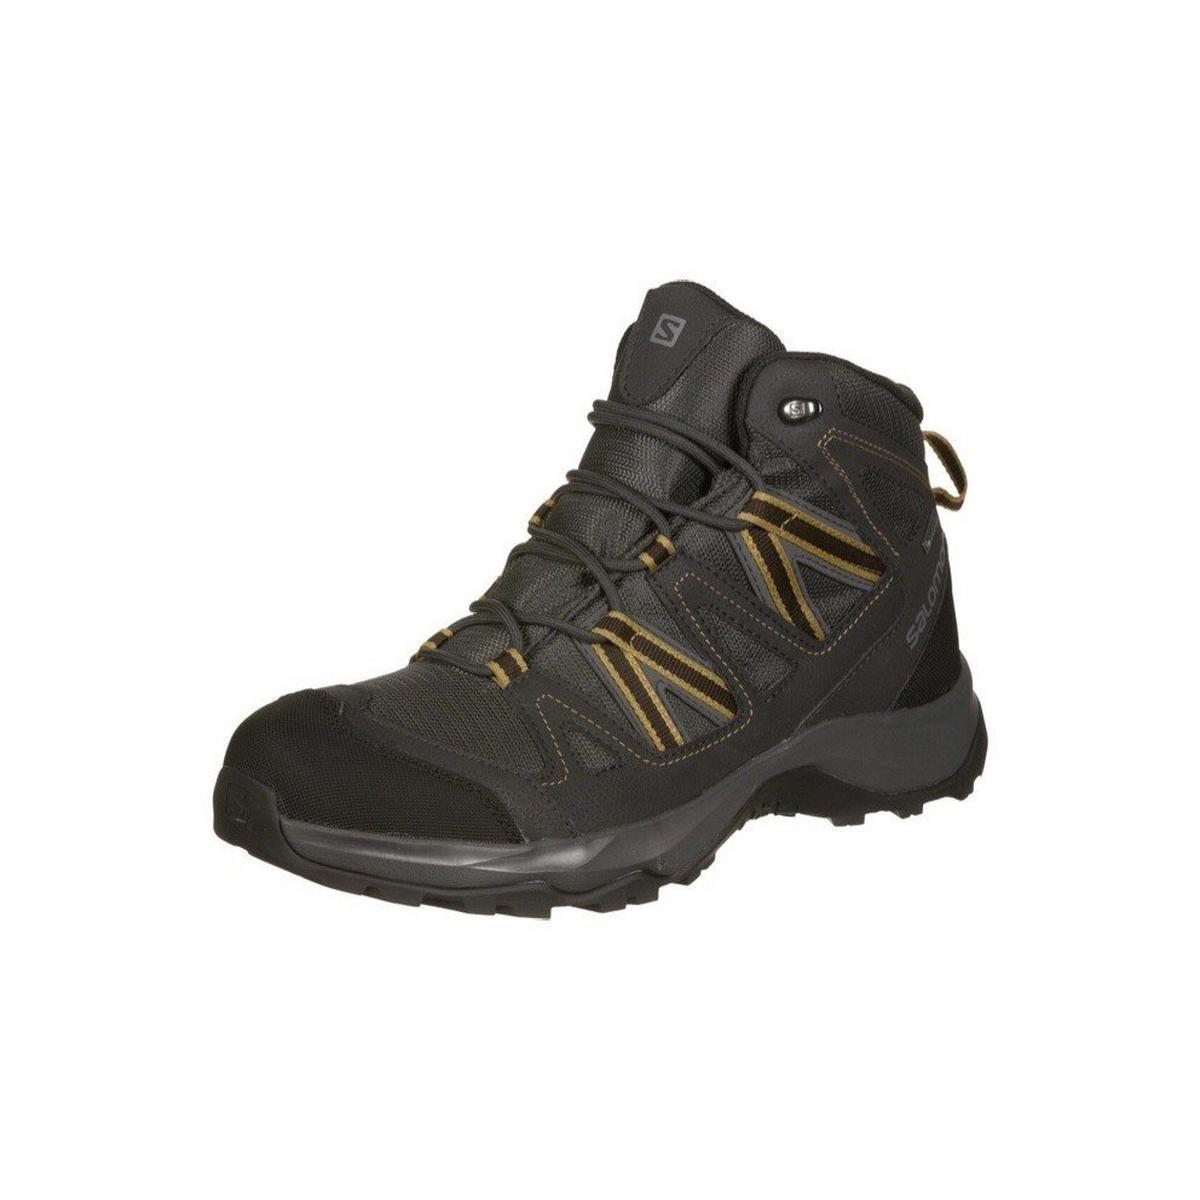 Salomon Men's Leighton Mid GORE-TEX Walking Boot